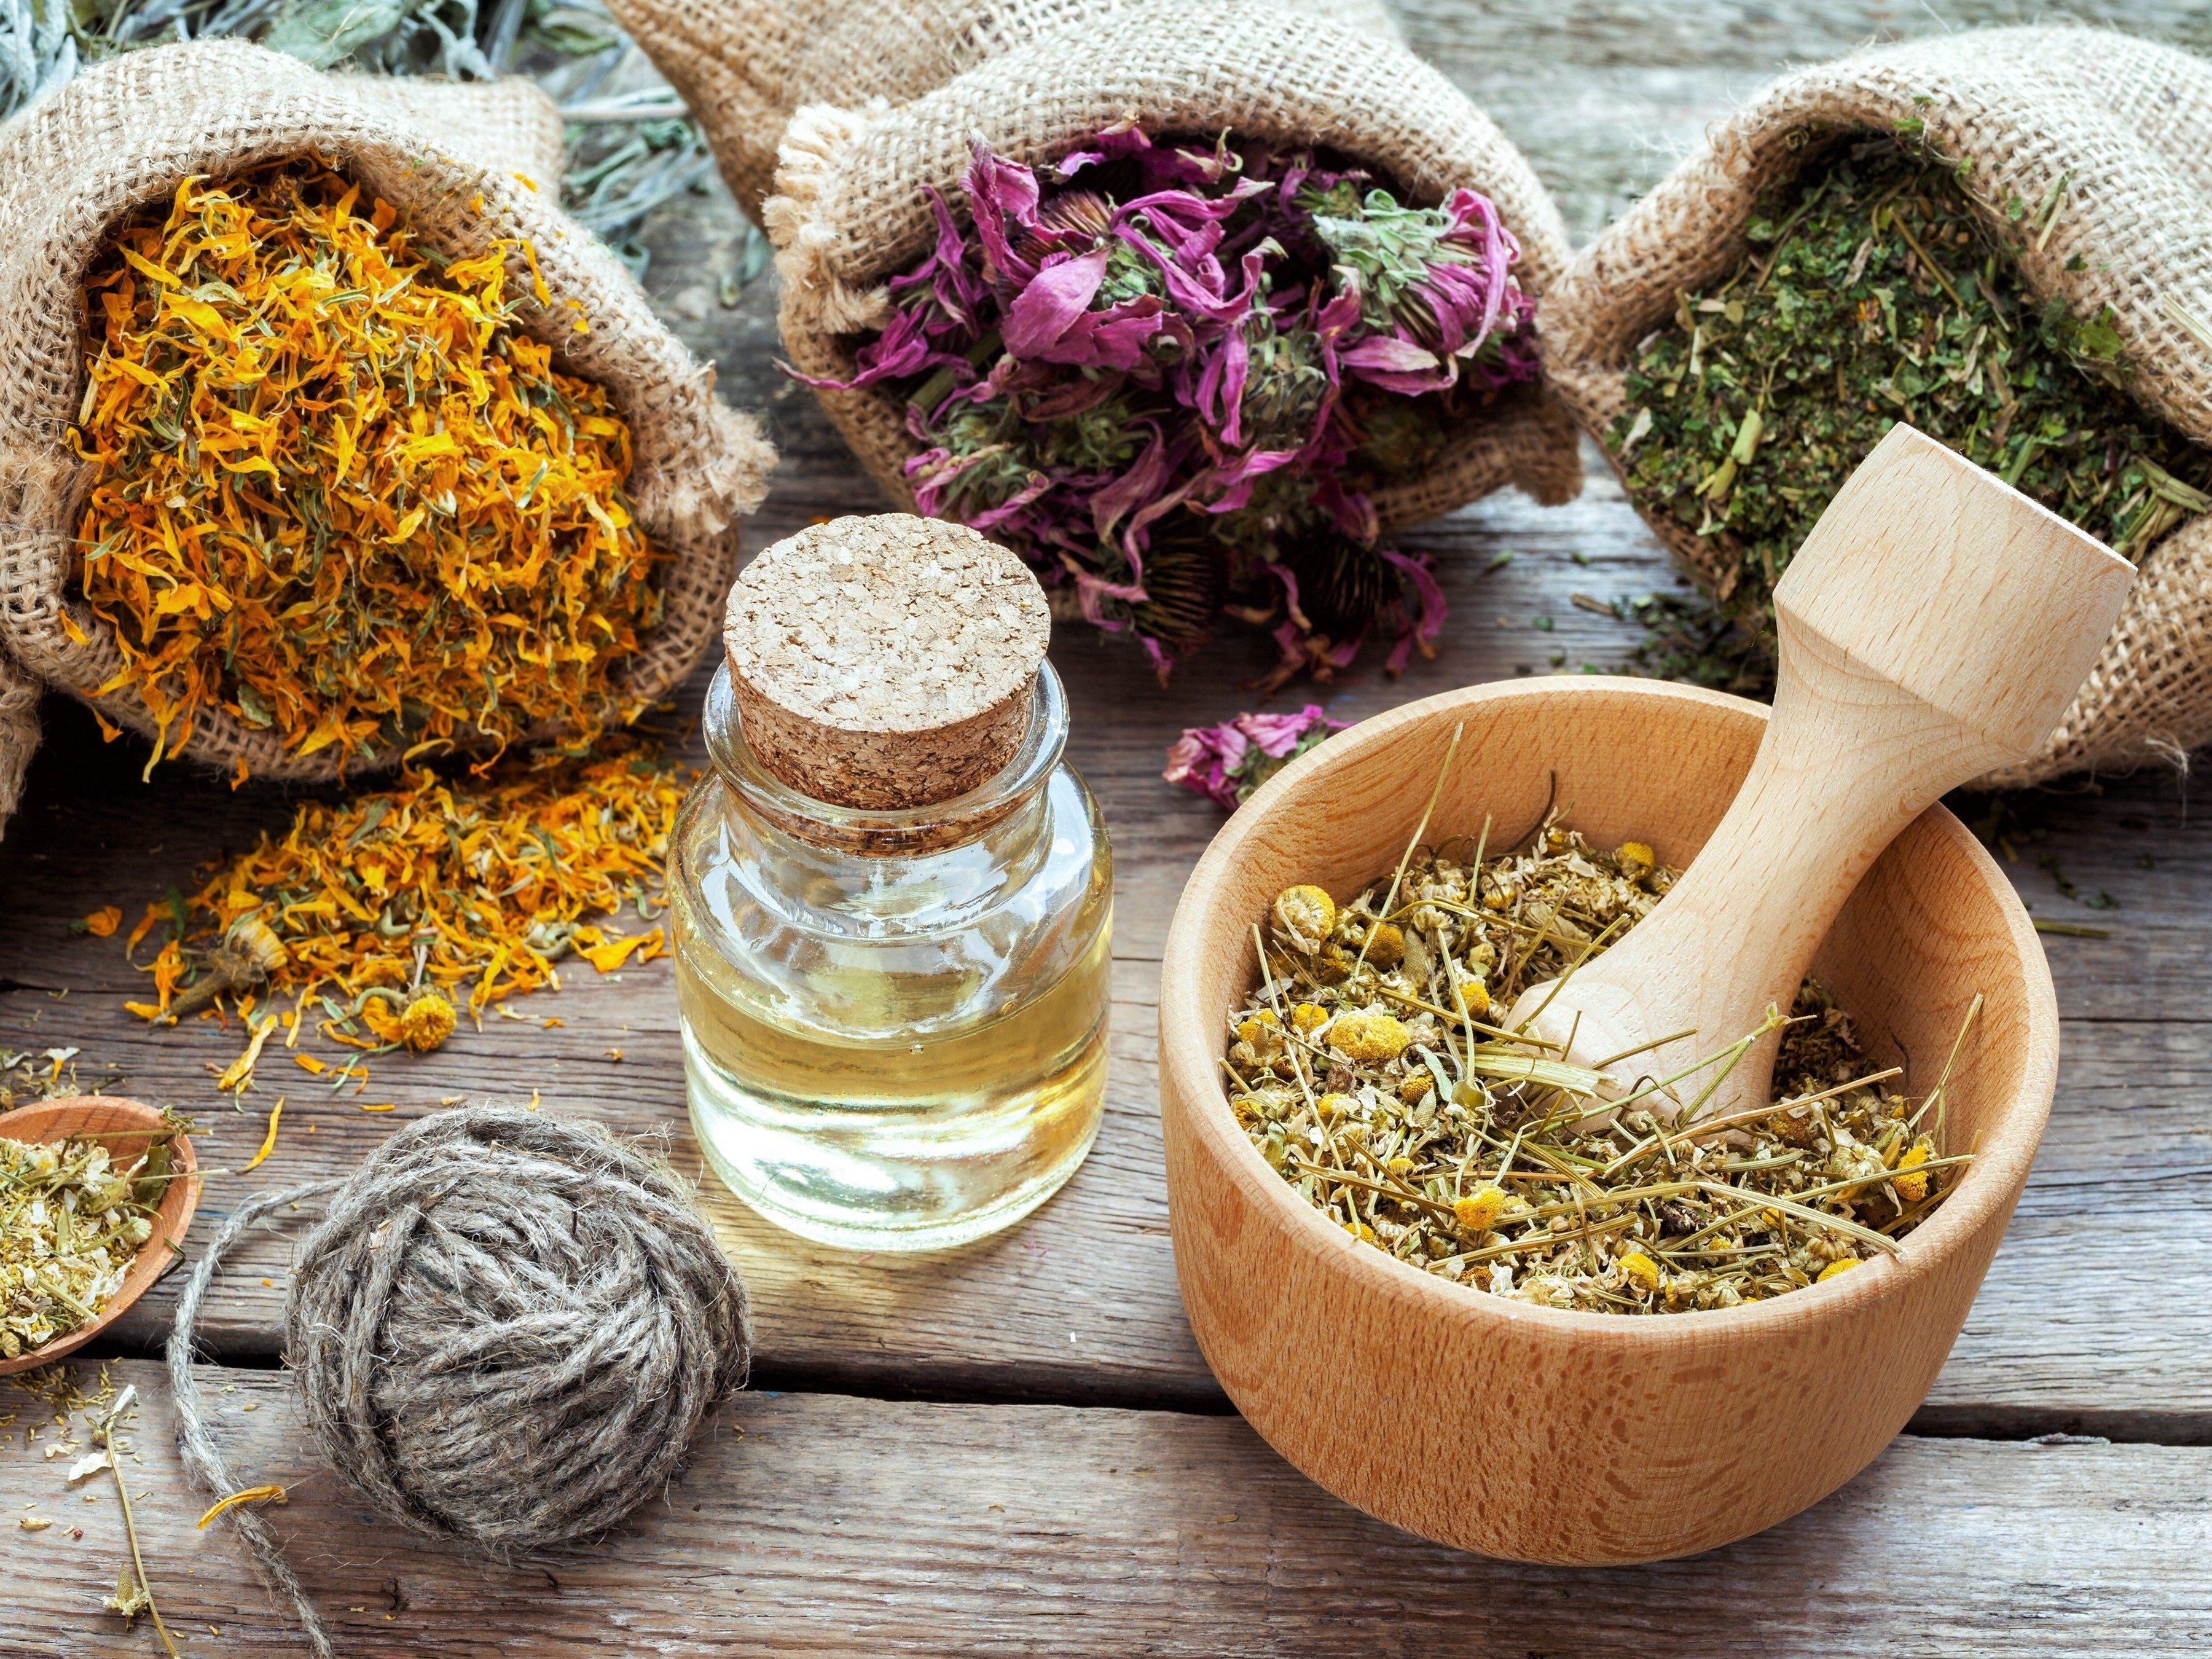 8. Homeopathy